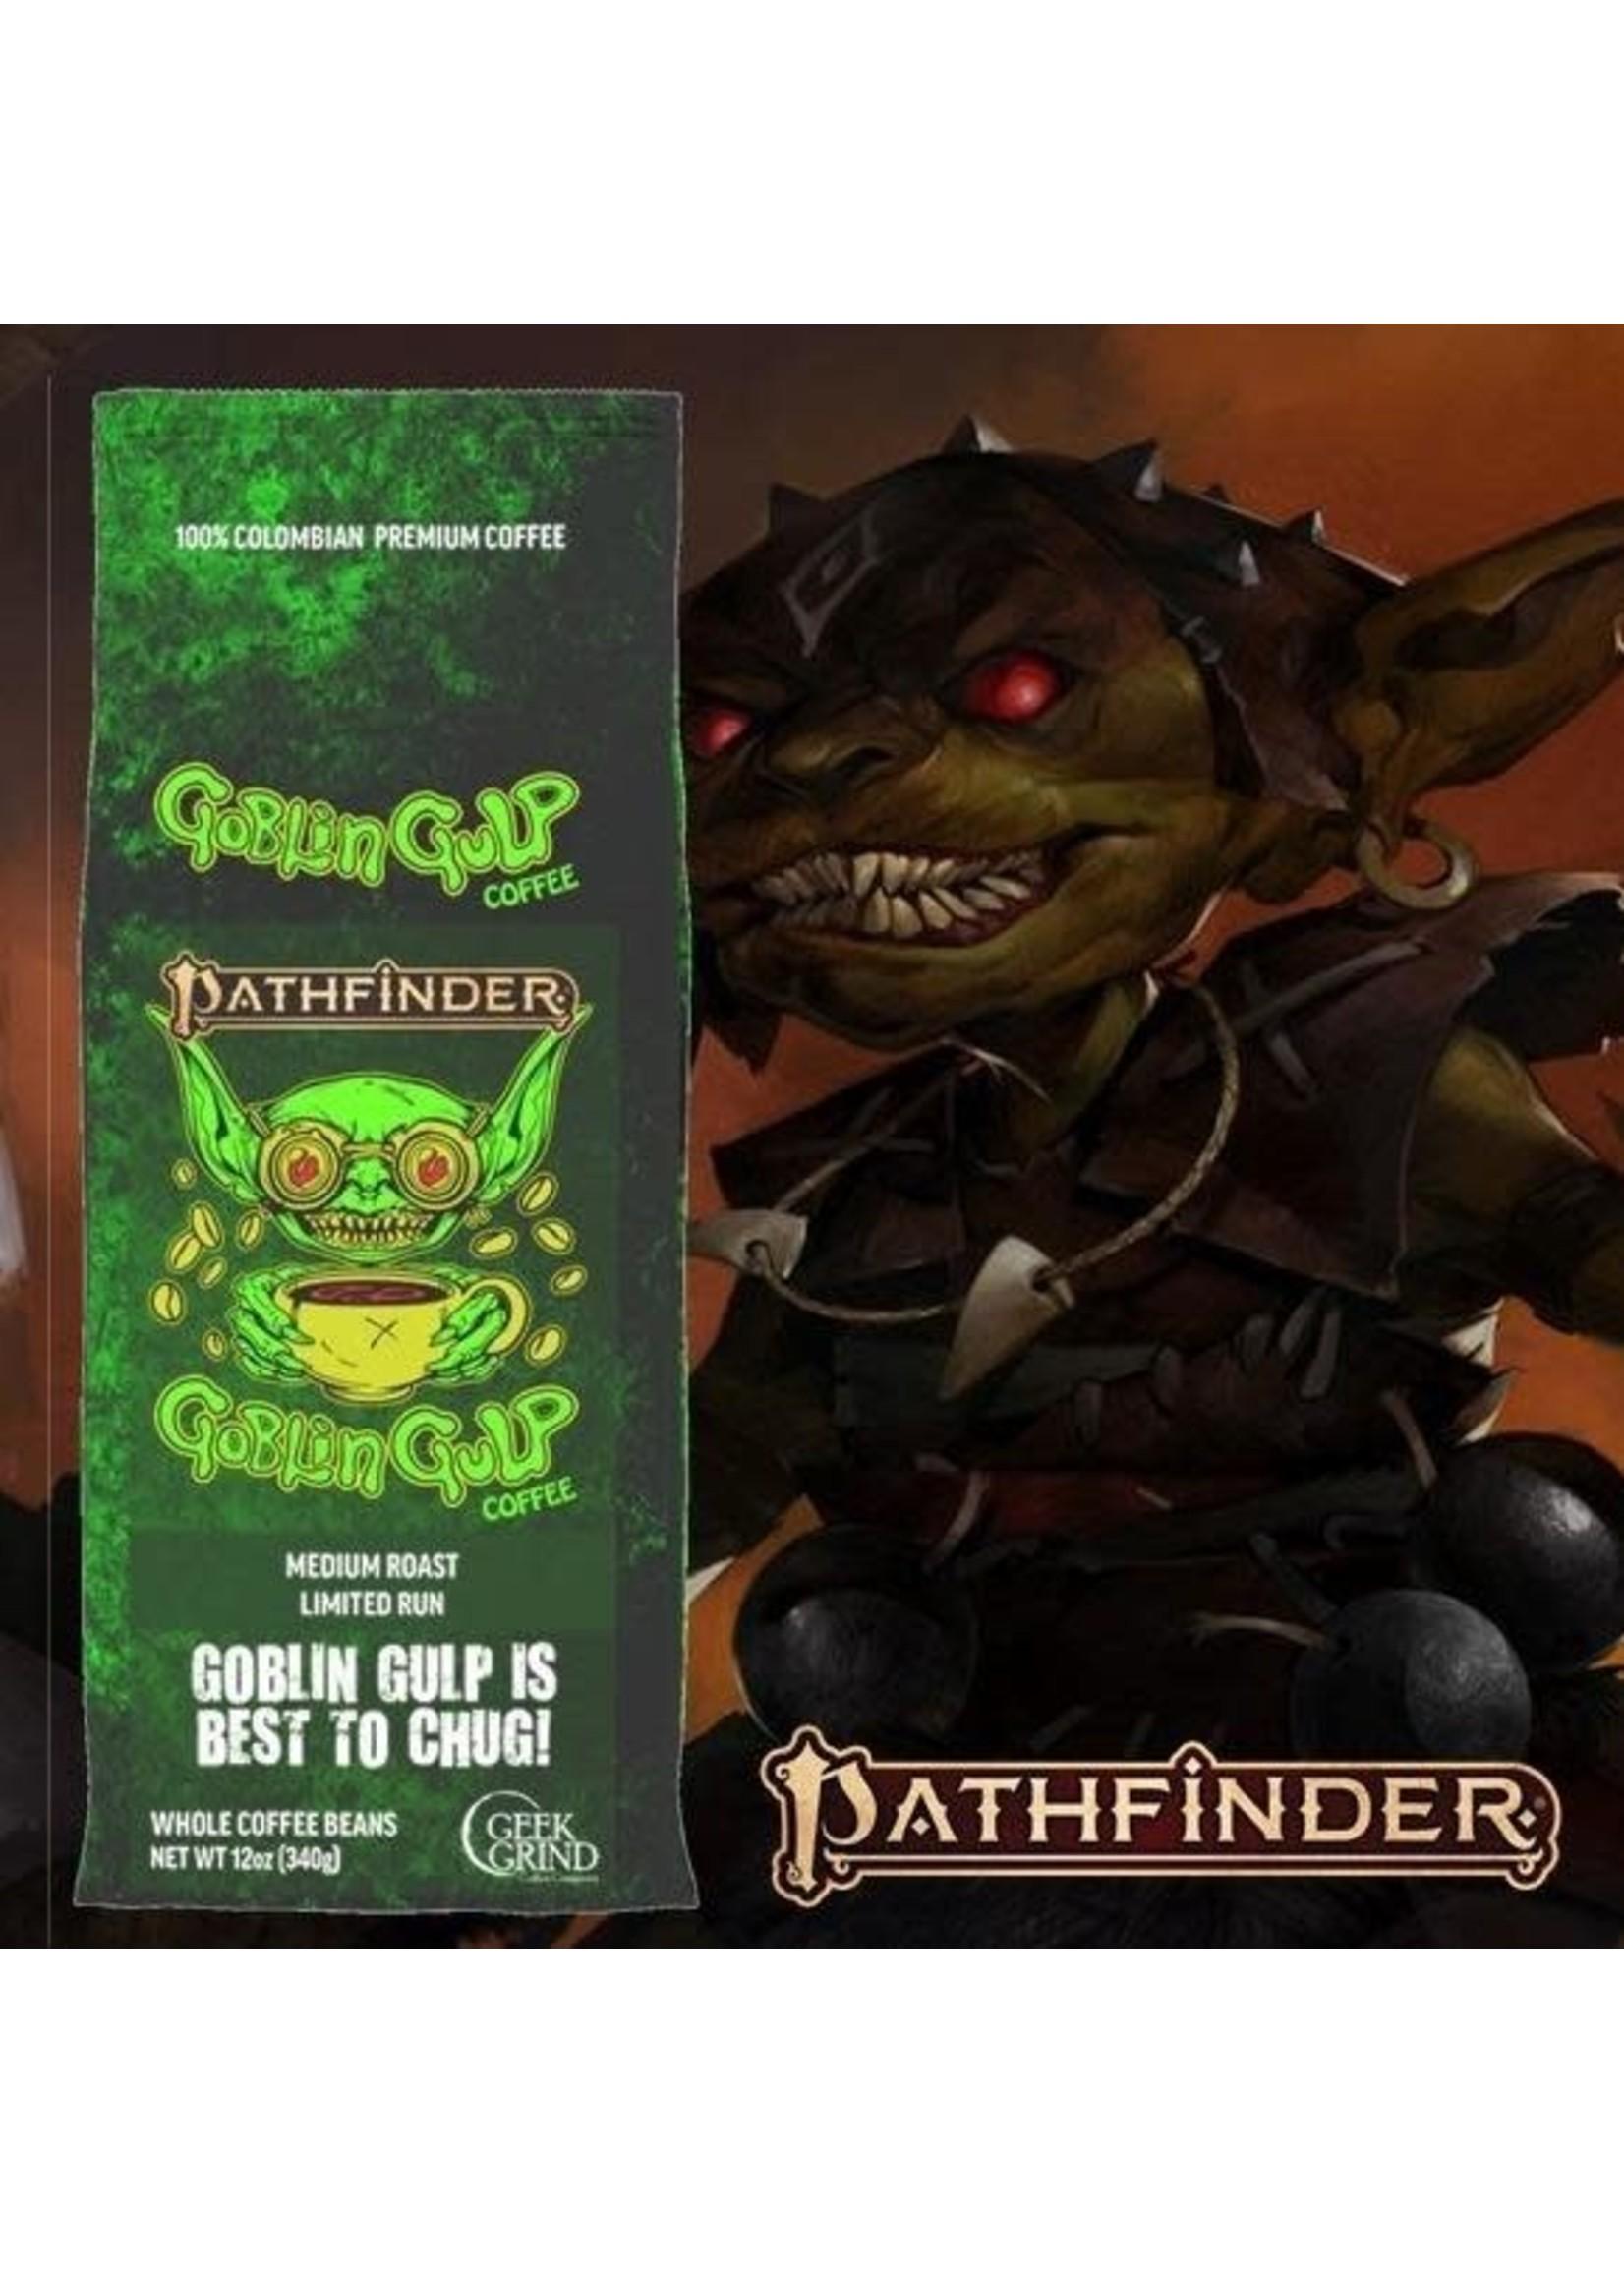 Geek Grind Goblin Gulp Coffee from Pathfinder - Medium Roast - 12 oz